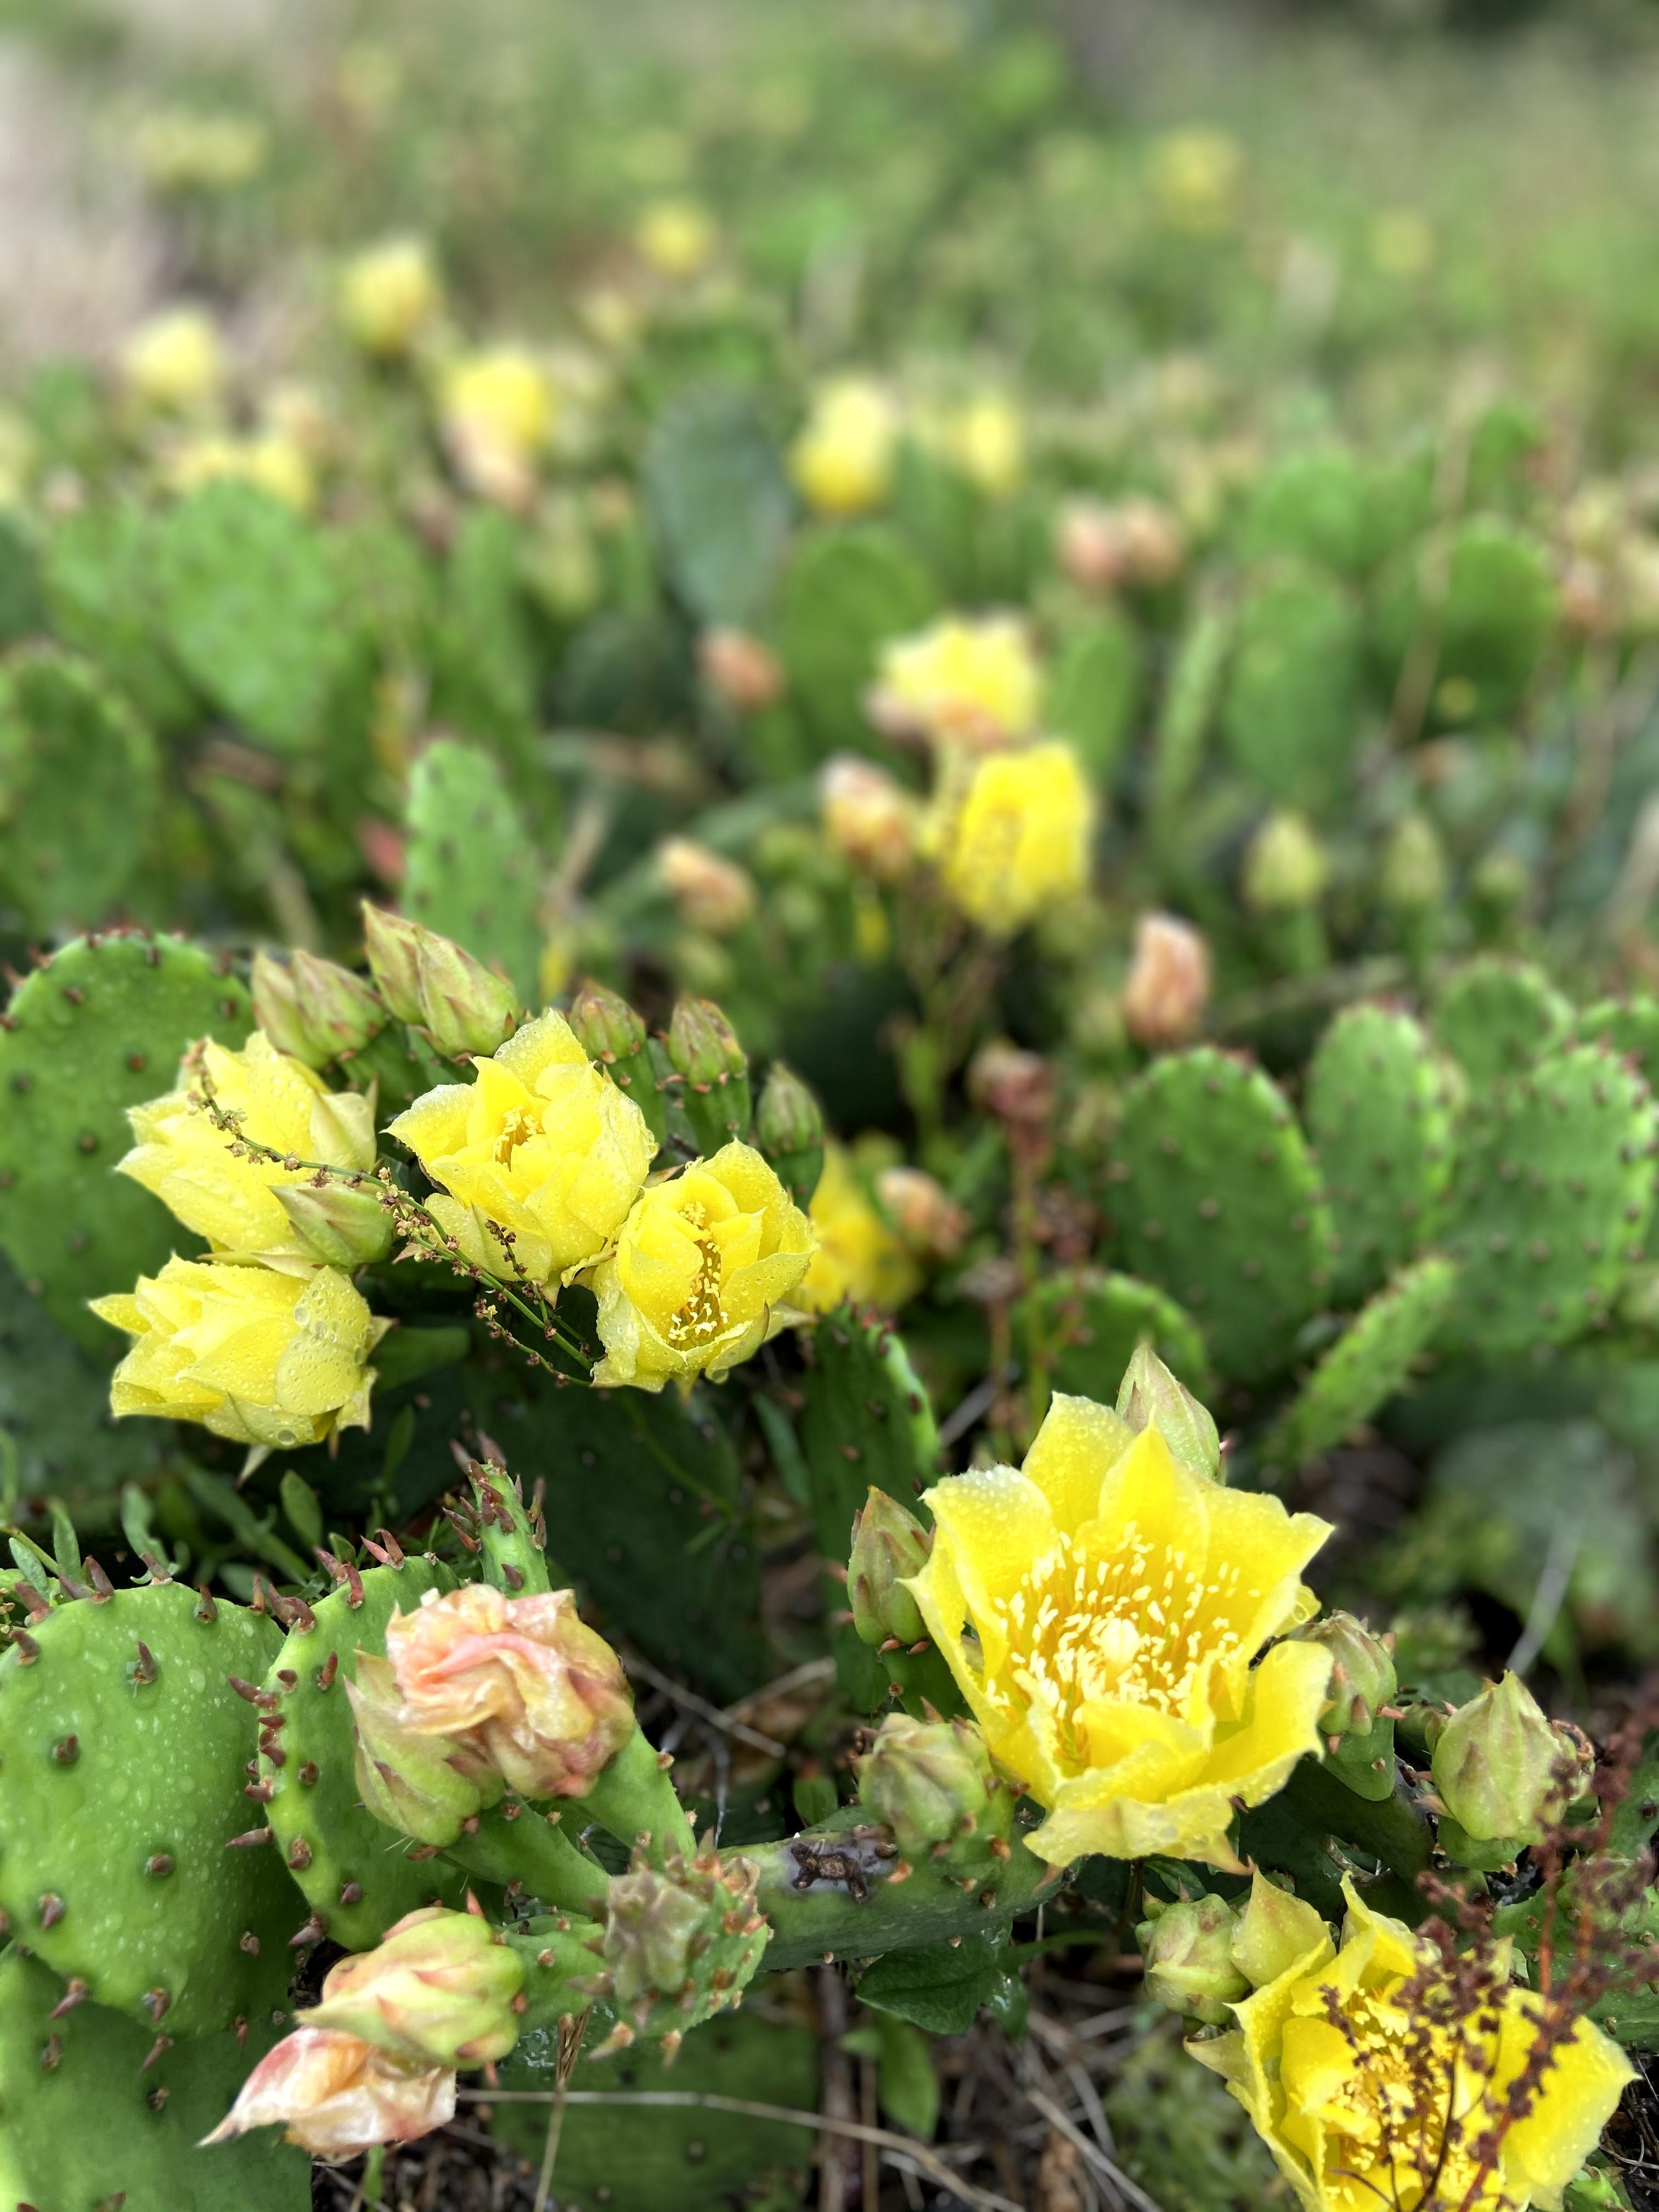 Assateague National Seashore - Cactus Flowers